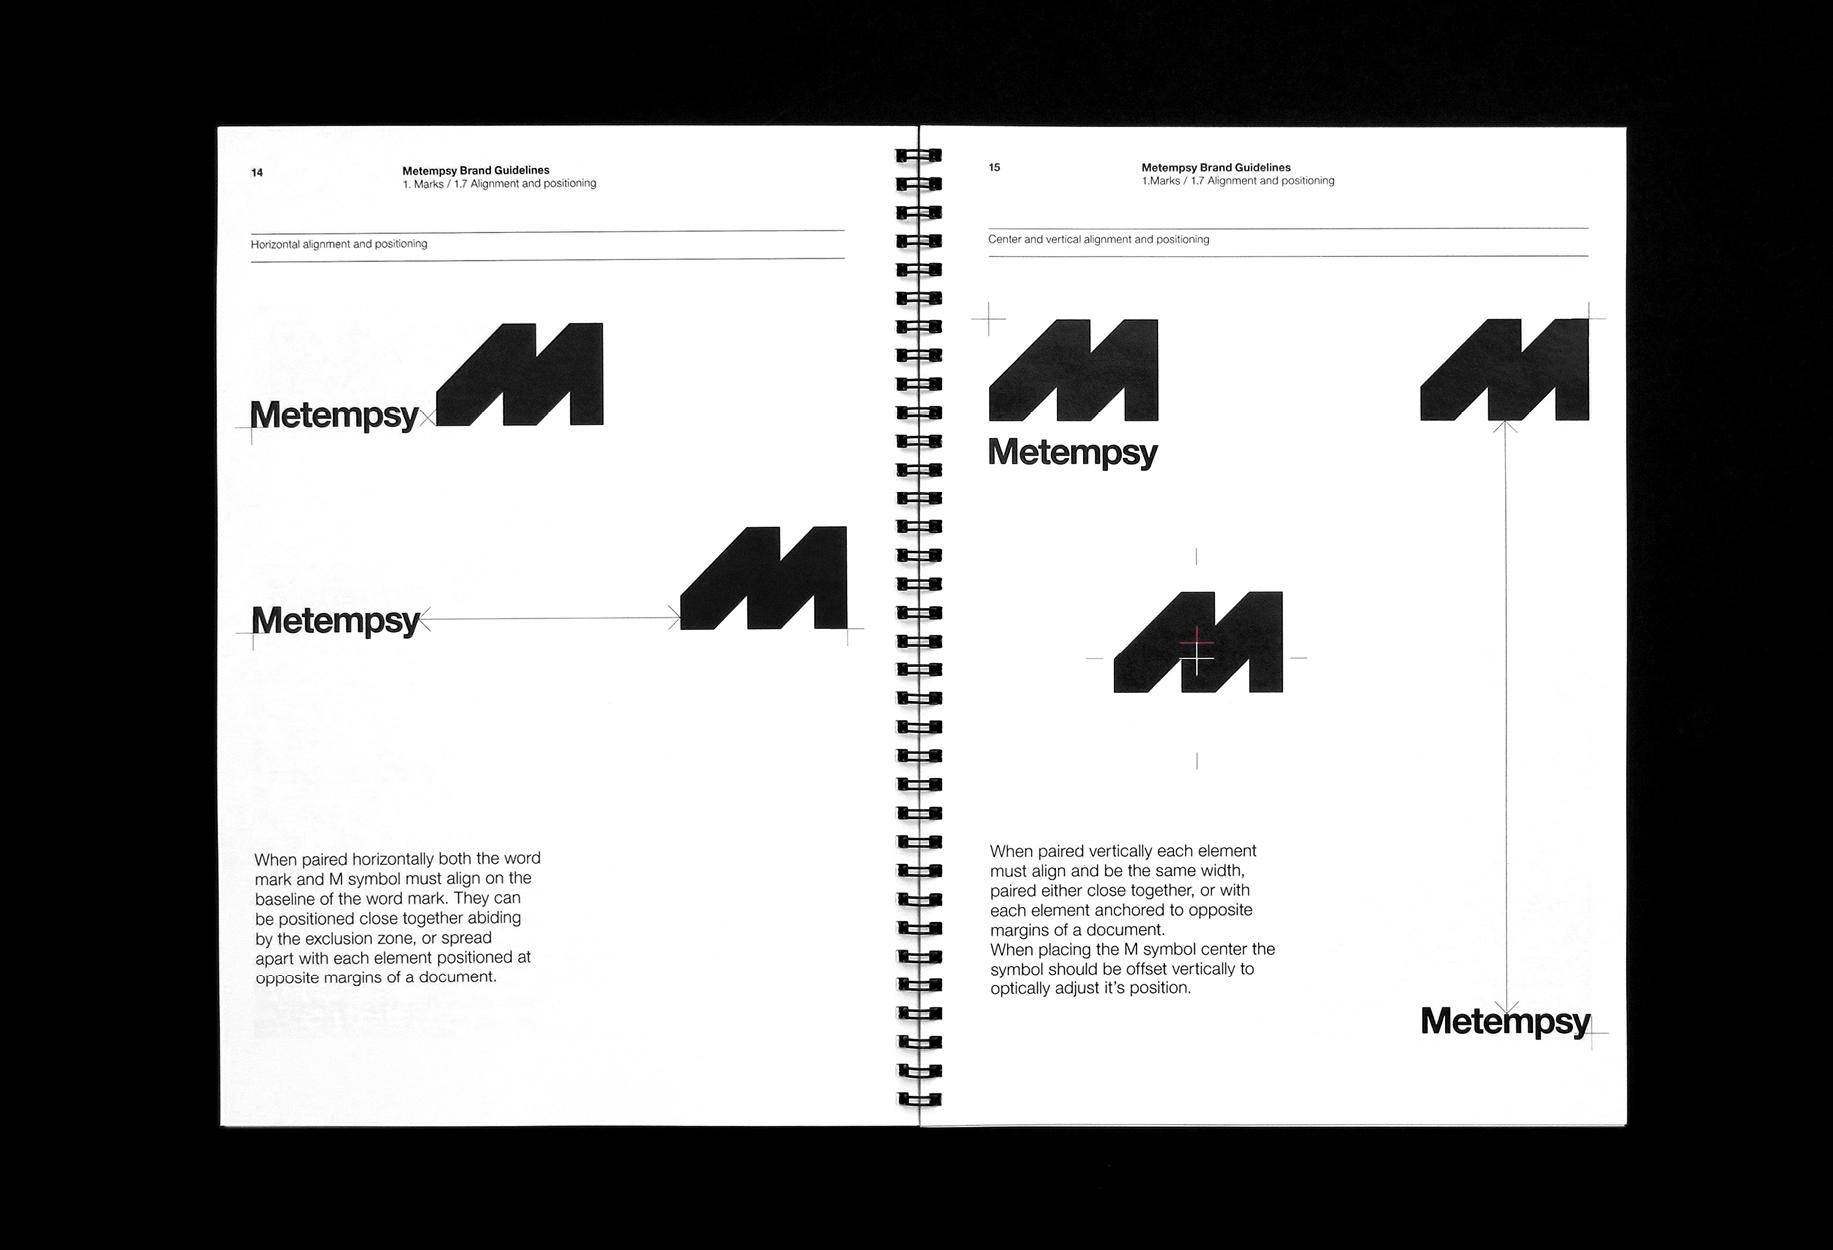 Metempsy-Graphic-Design-Standards-Manual-8.jpg